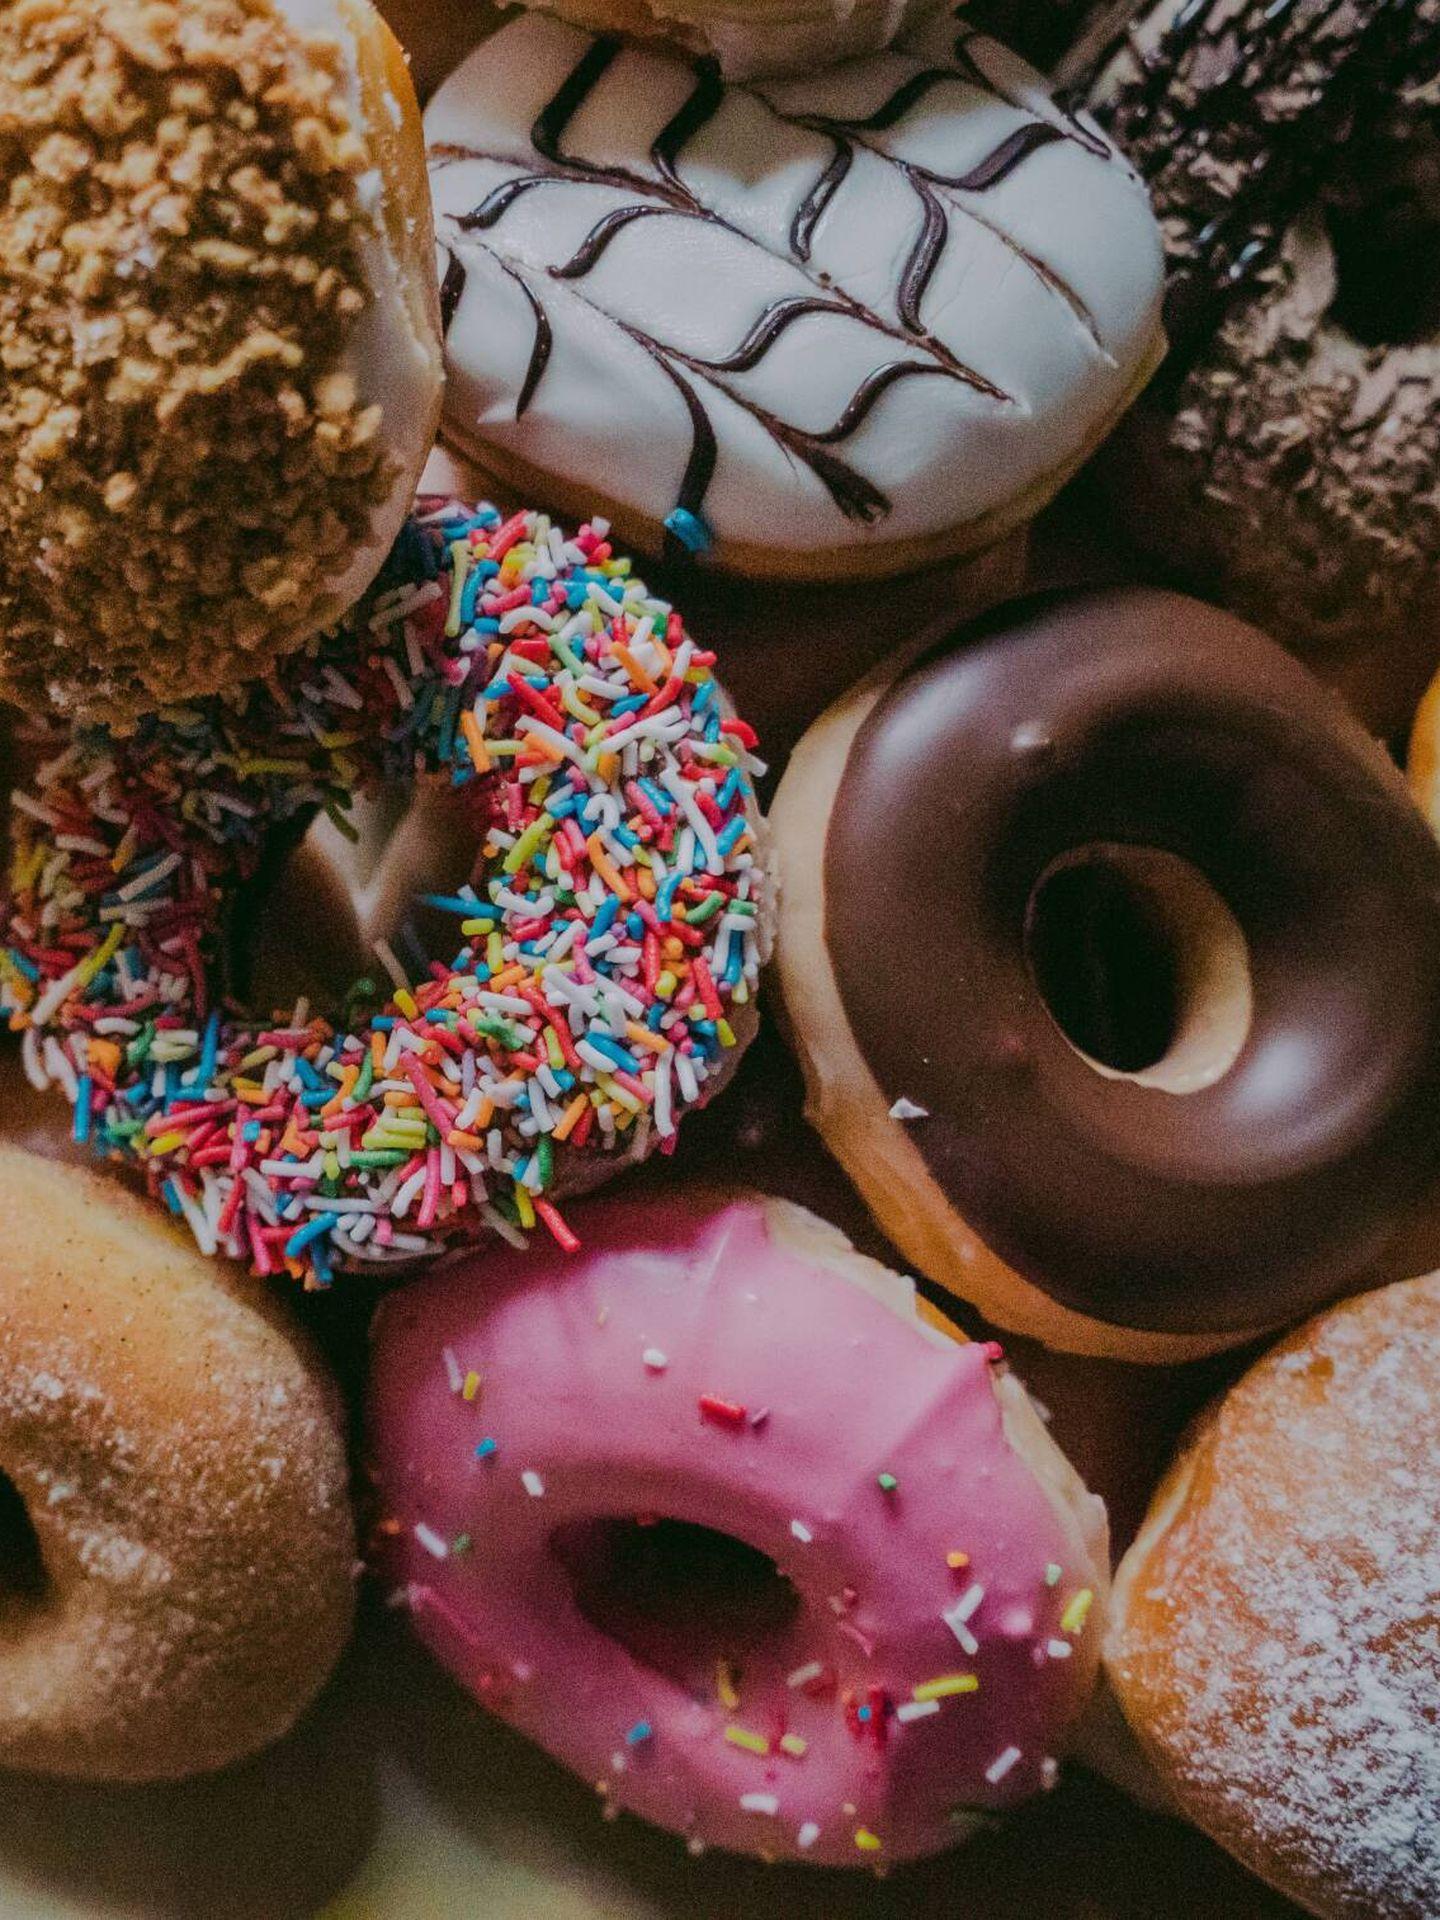 Trucos para reducir el azúcar en tu dieta. (Rod Long para Unsplash)